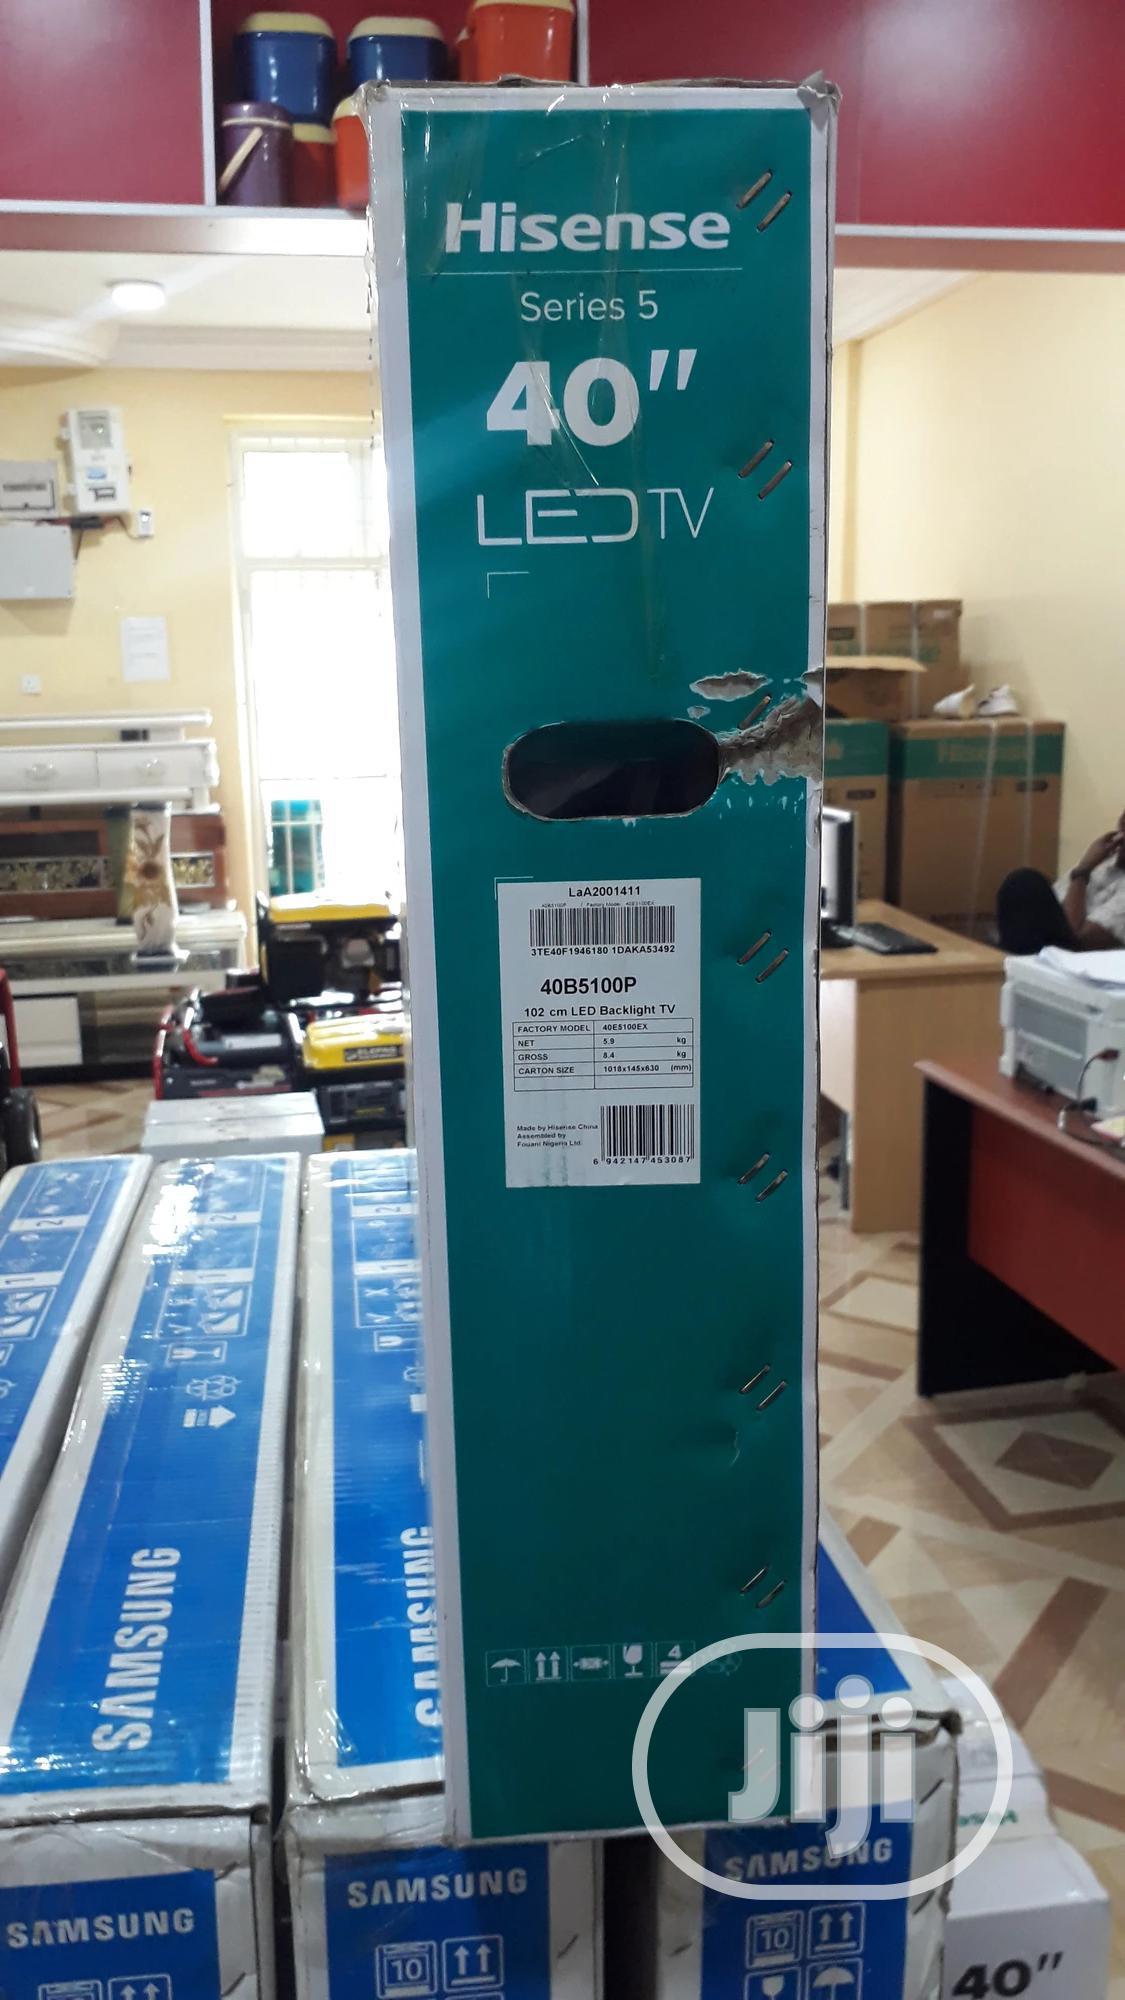 Hisense Led Tv 40 Inches | TV & DVD Equipment for sale in Kado, Abuja (FCT) State, Nigeria